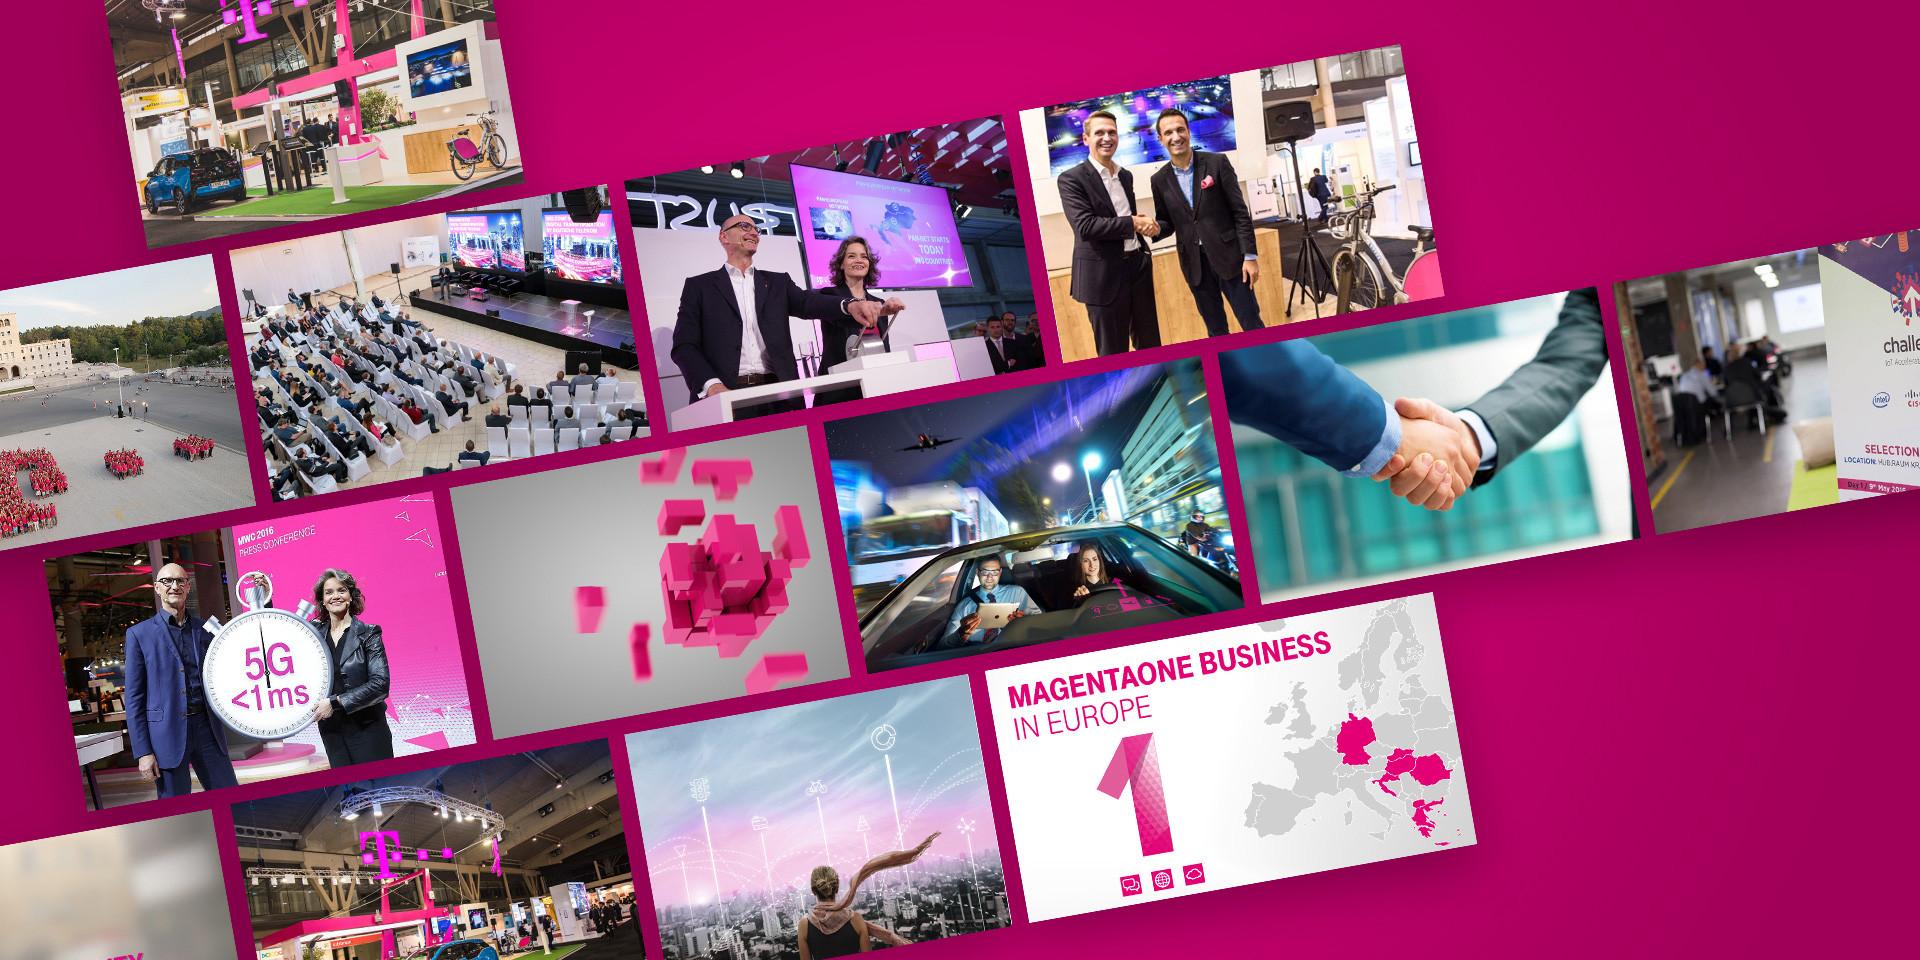 Deutsche Telekom – B2B Europe – Public Relations